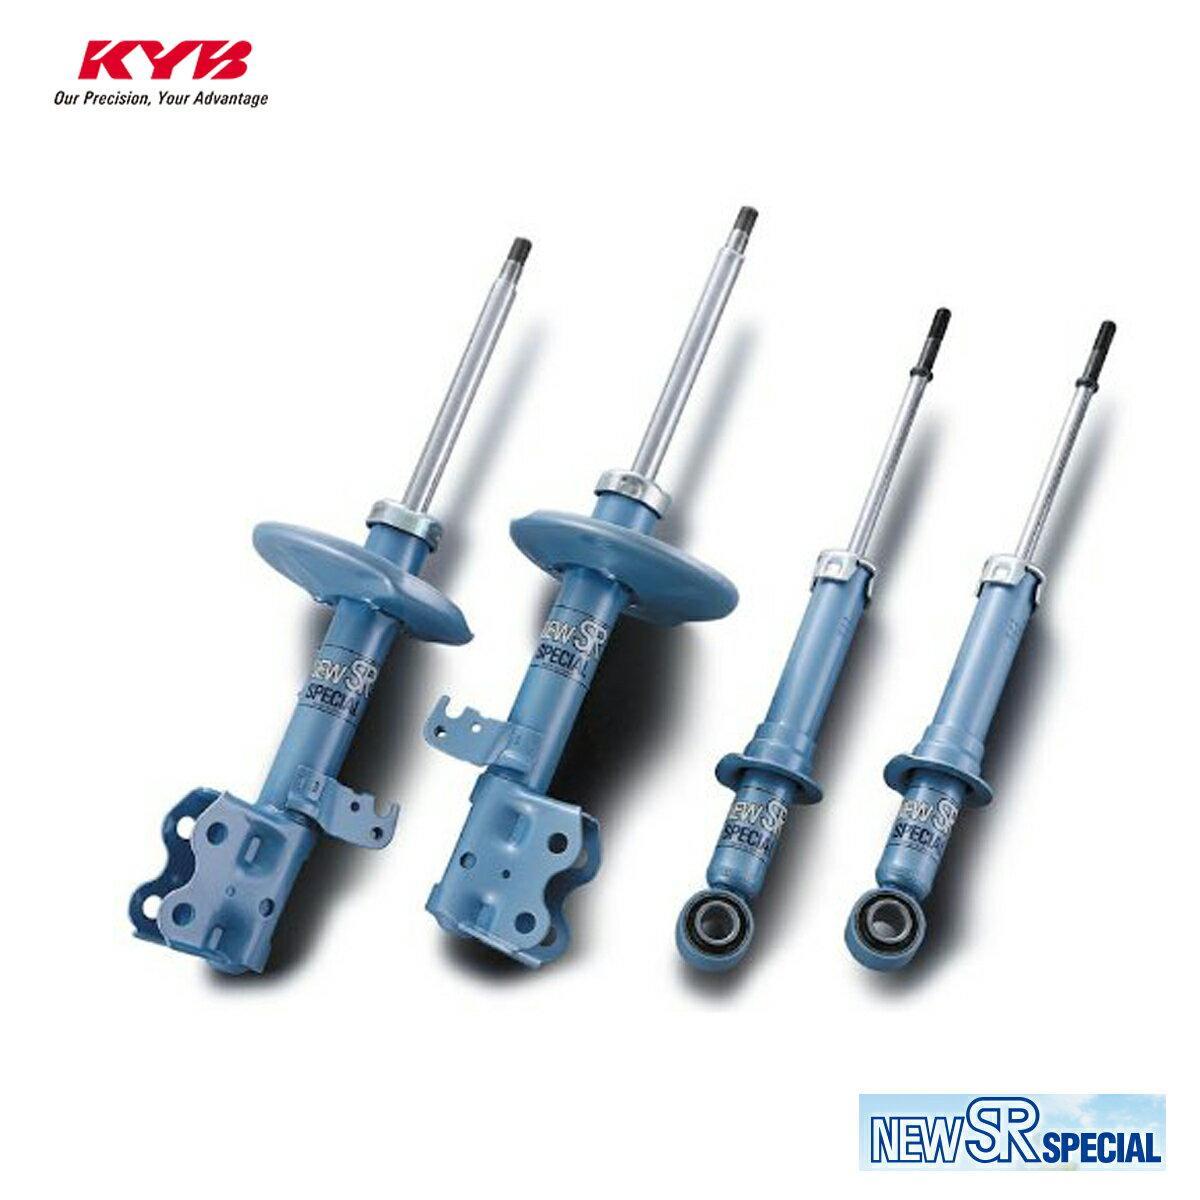 KYB カヤバ タント タントカスタム L360S ショックアブソーバー 1台分 NEW SR SPECIAL NS-53061049 配送先条件有り